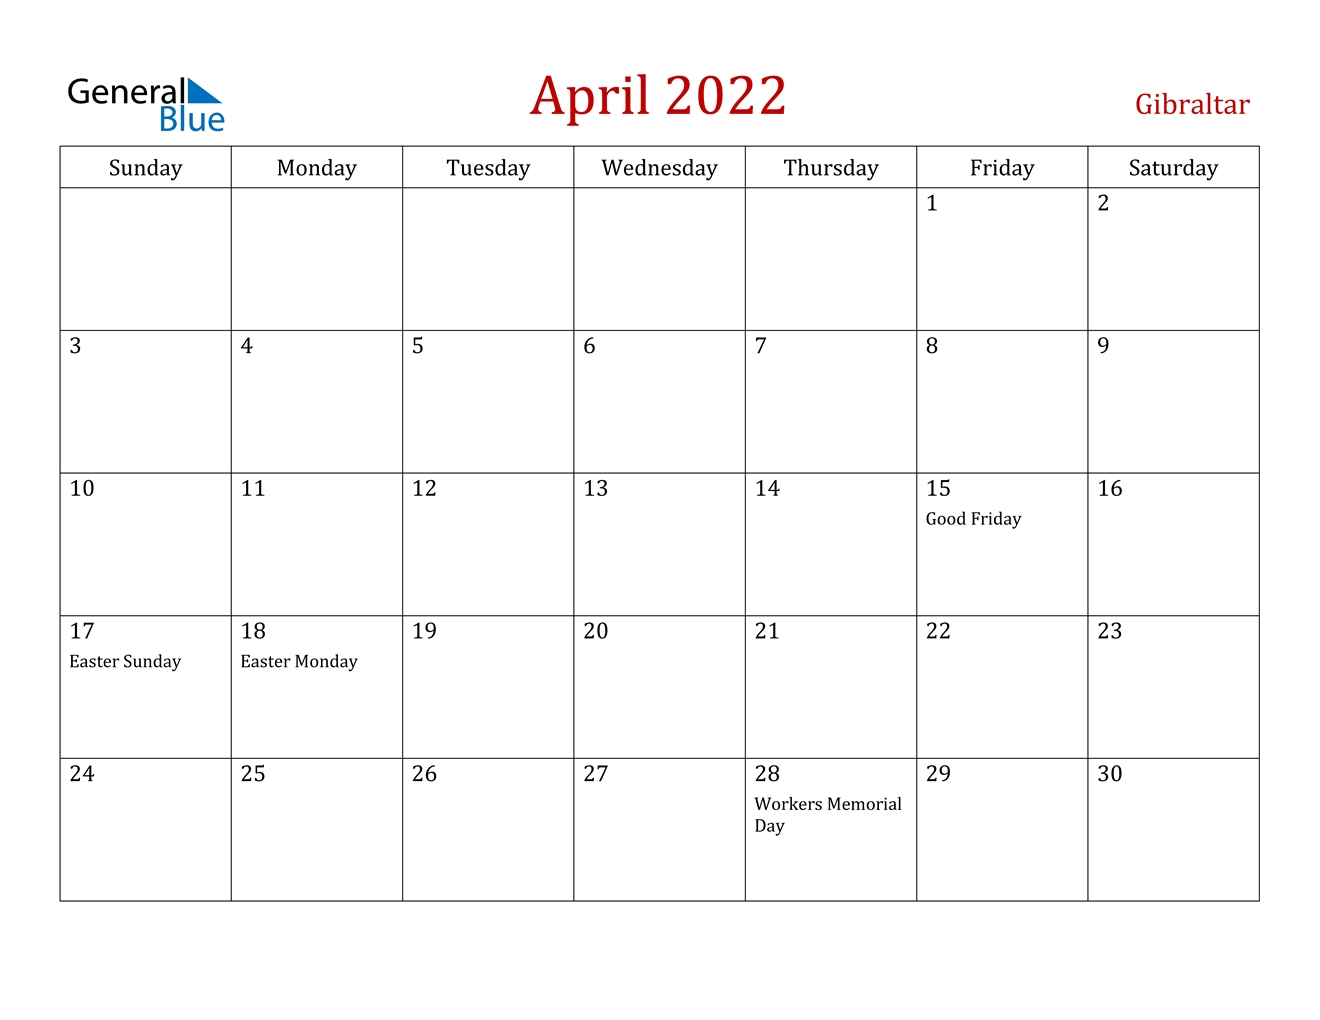 April 2022 Calendar - Gibraltar